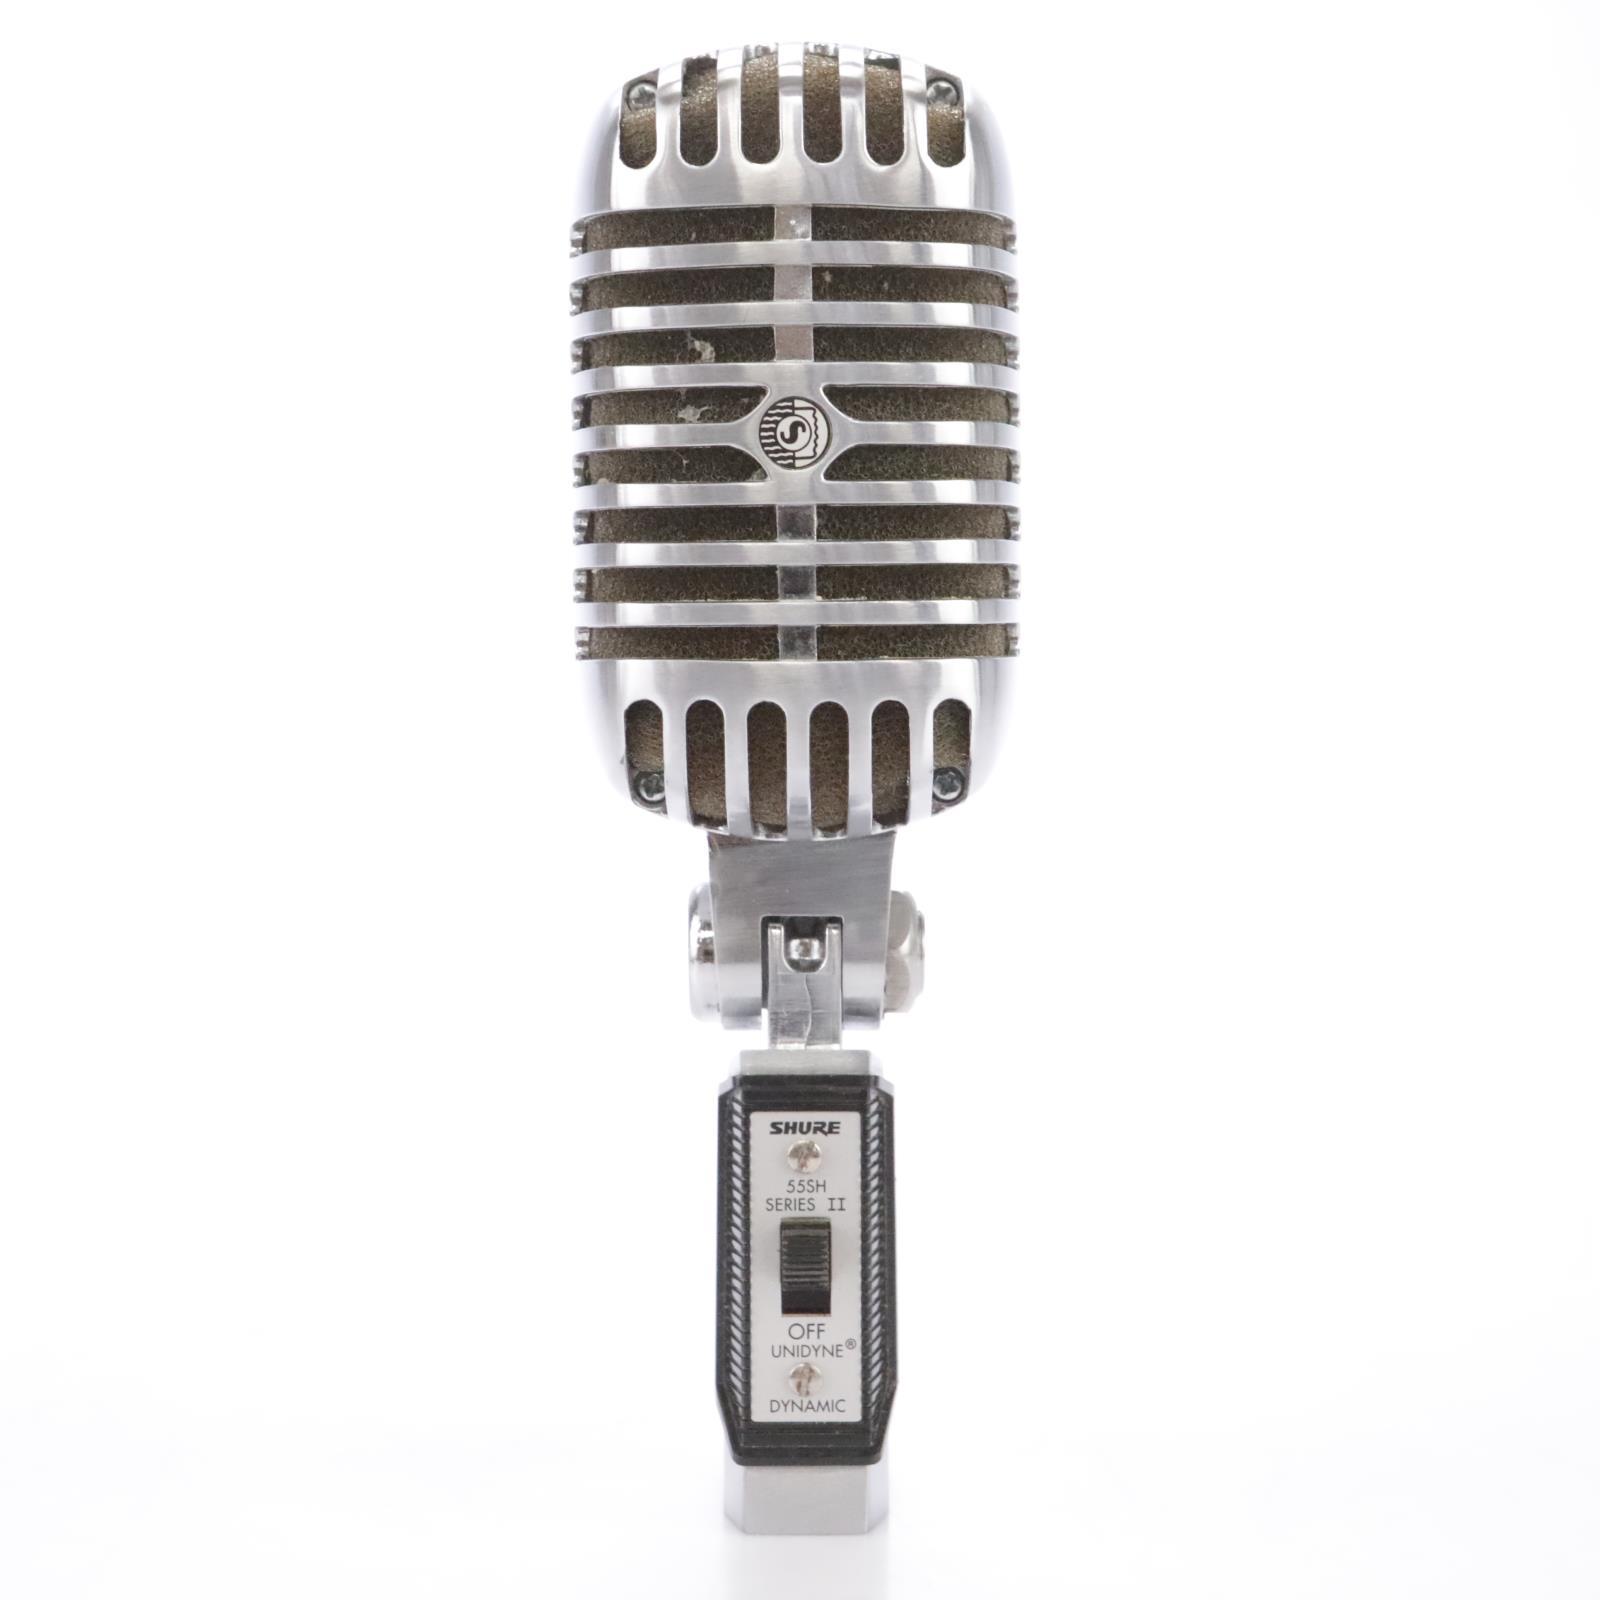 Shure 55SH Series II Cardioid Dynamic Vocal Microphone w/ Soft Case #43147